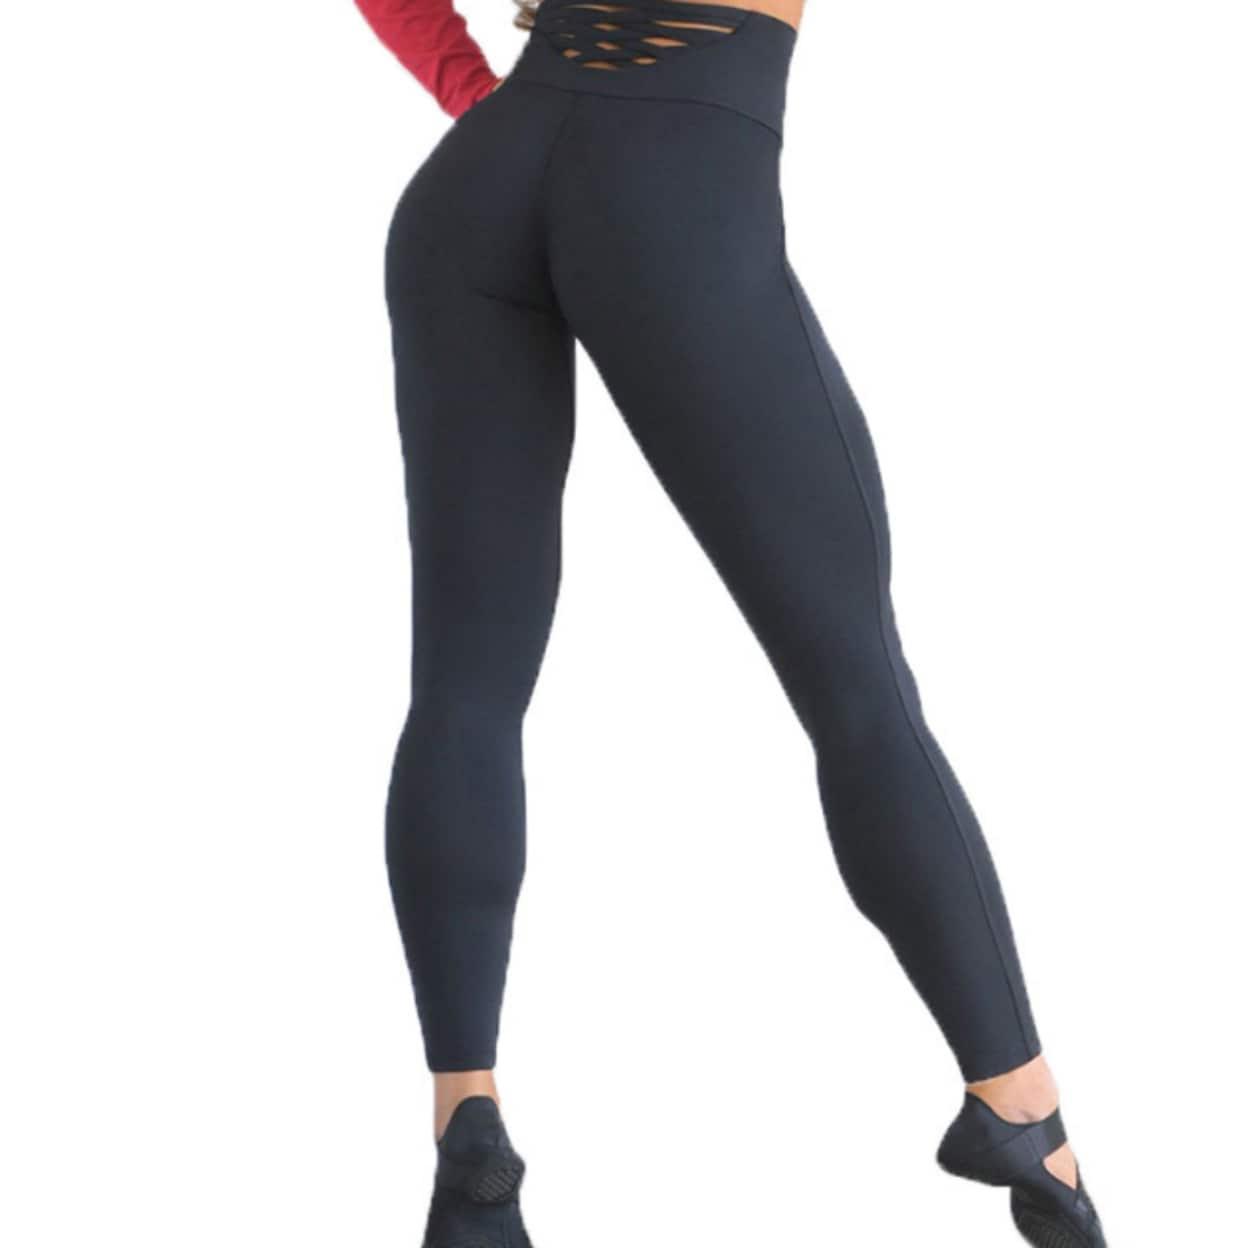 Yoga Pants for Women High Waist Pants Tummy Control Slimming Booty Leggings Lift Tights Pants